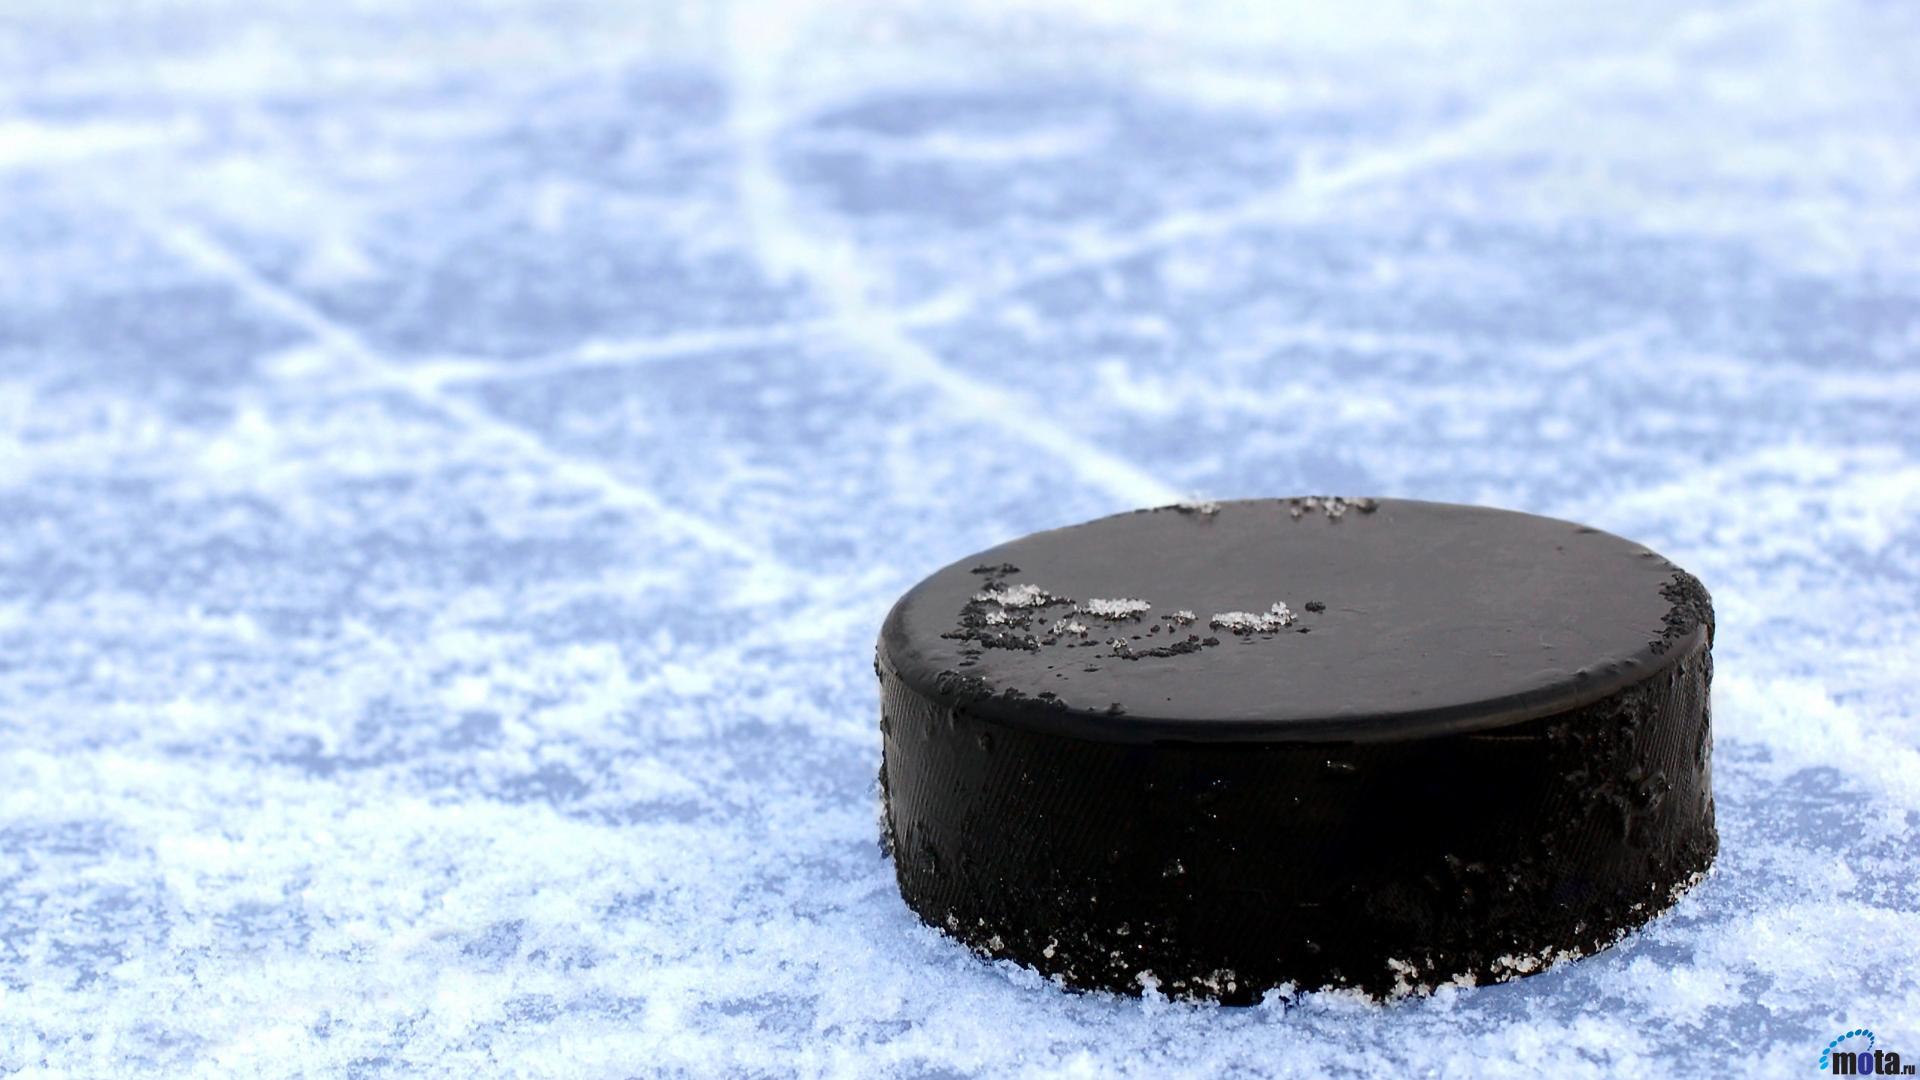 Download Wallpaper Hockey puck on ice 1920 x 1080 HDTV 1080p 1920x1080